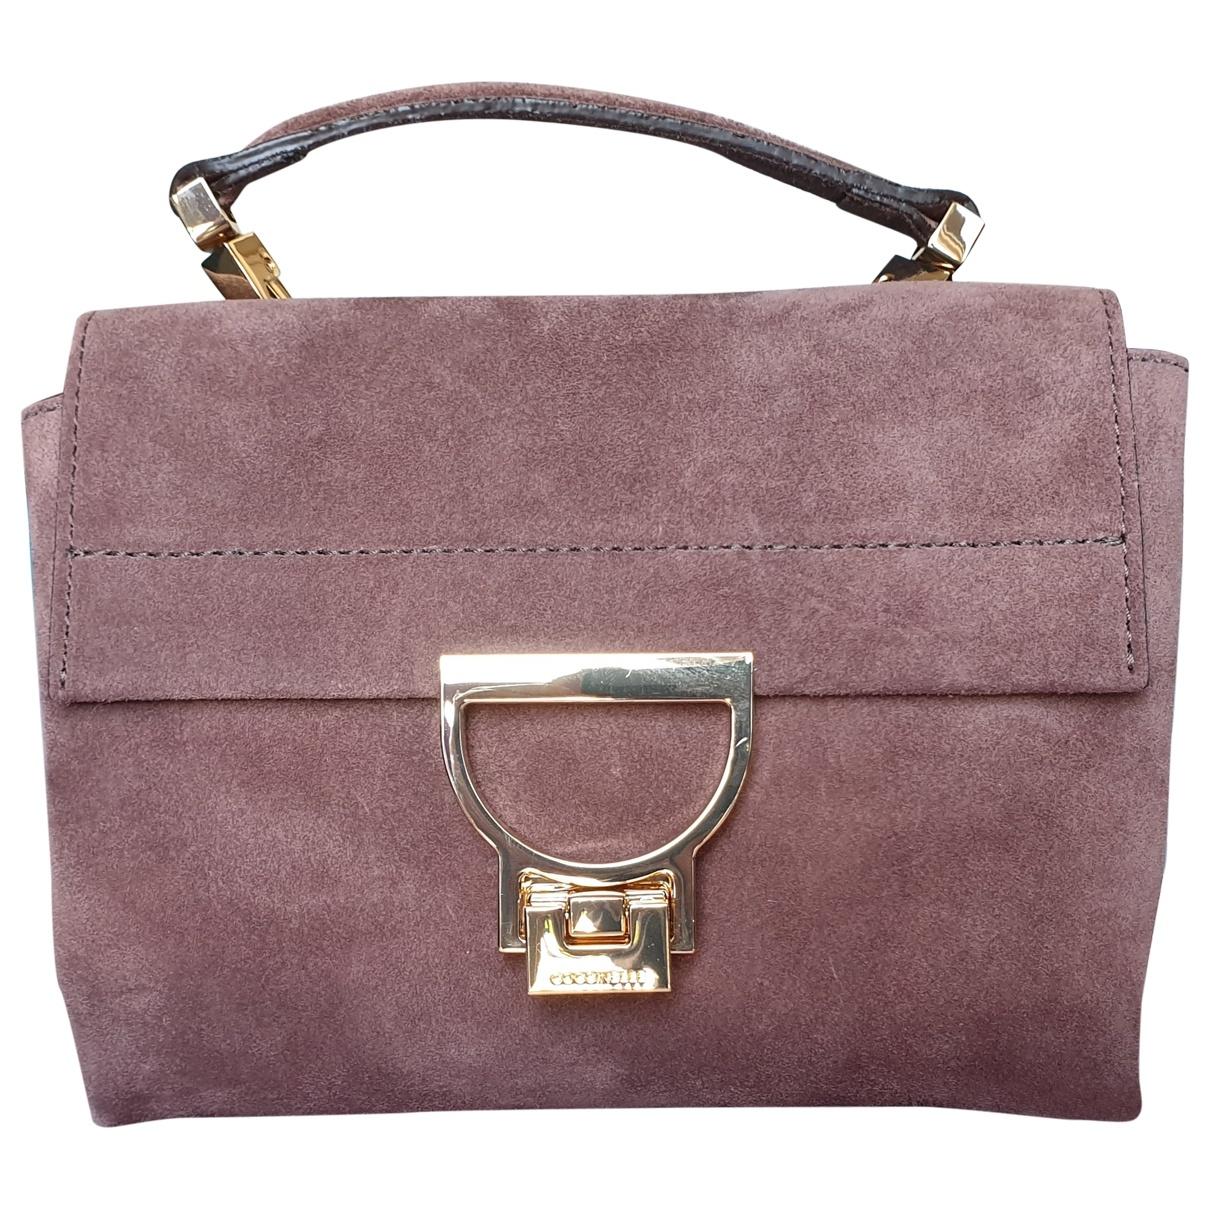 Coccinelle \N Suede Clutch bag for Women \N